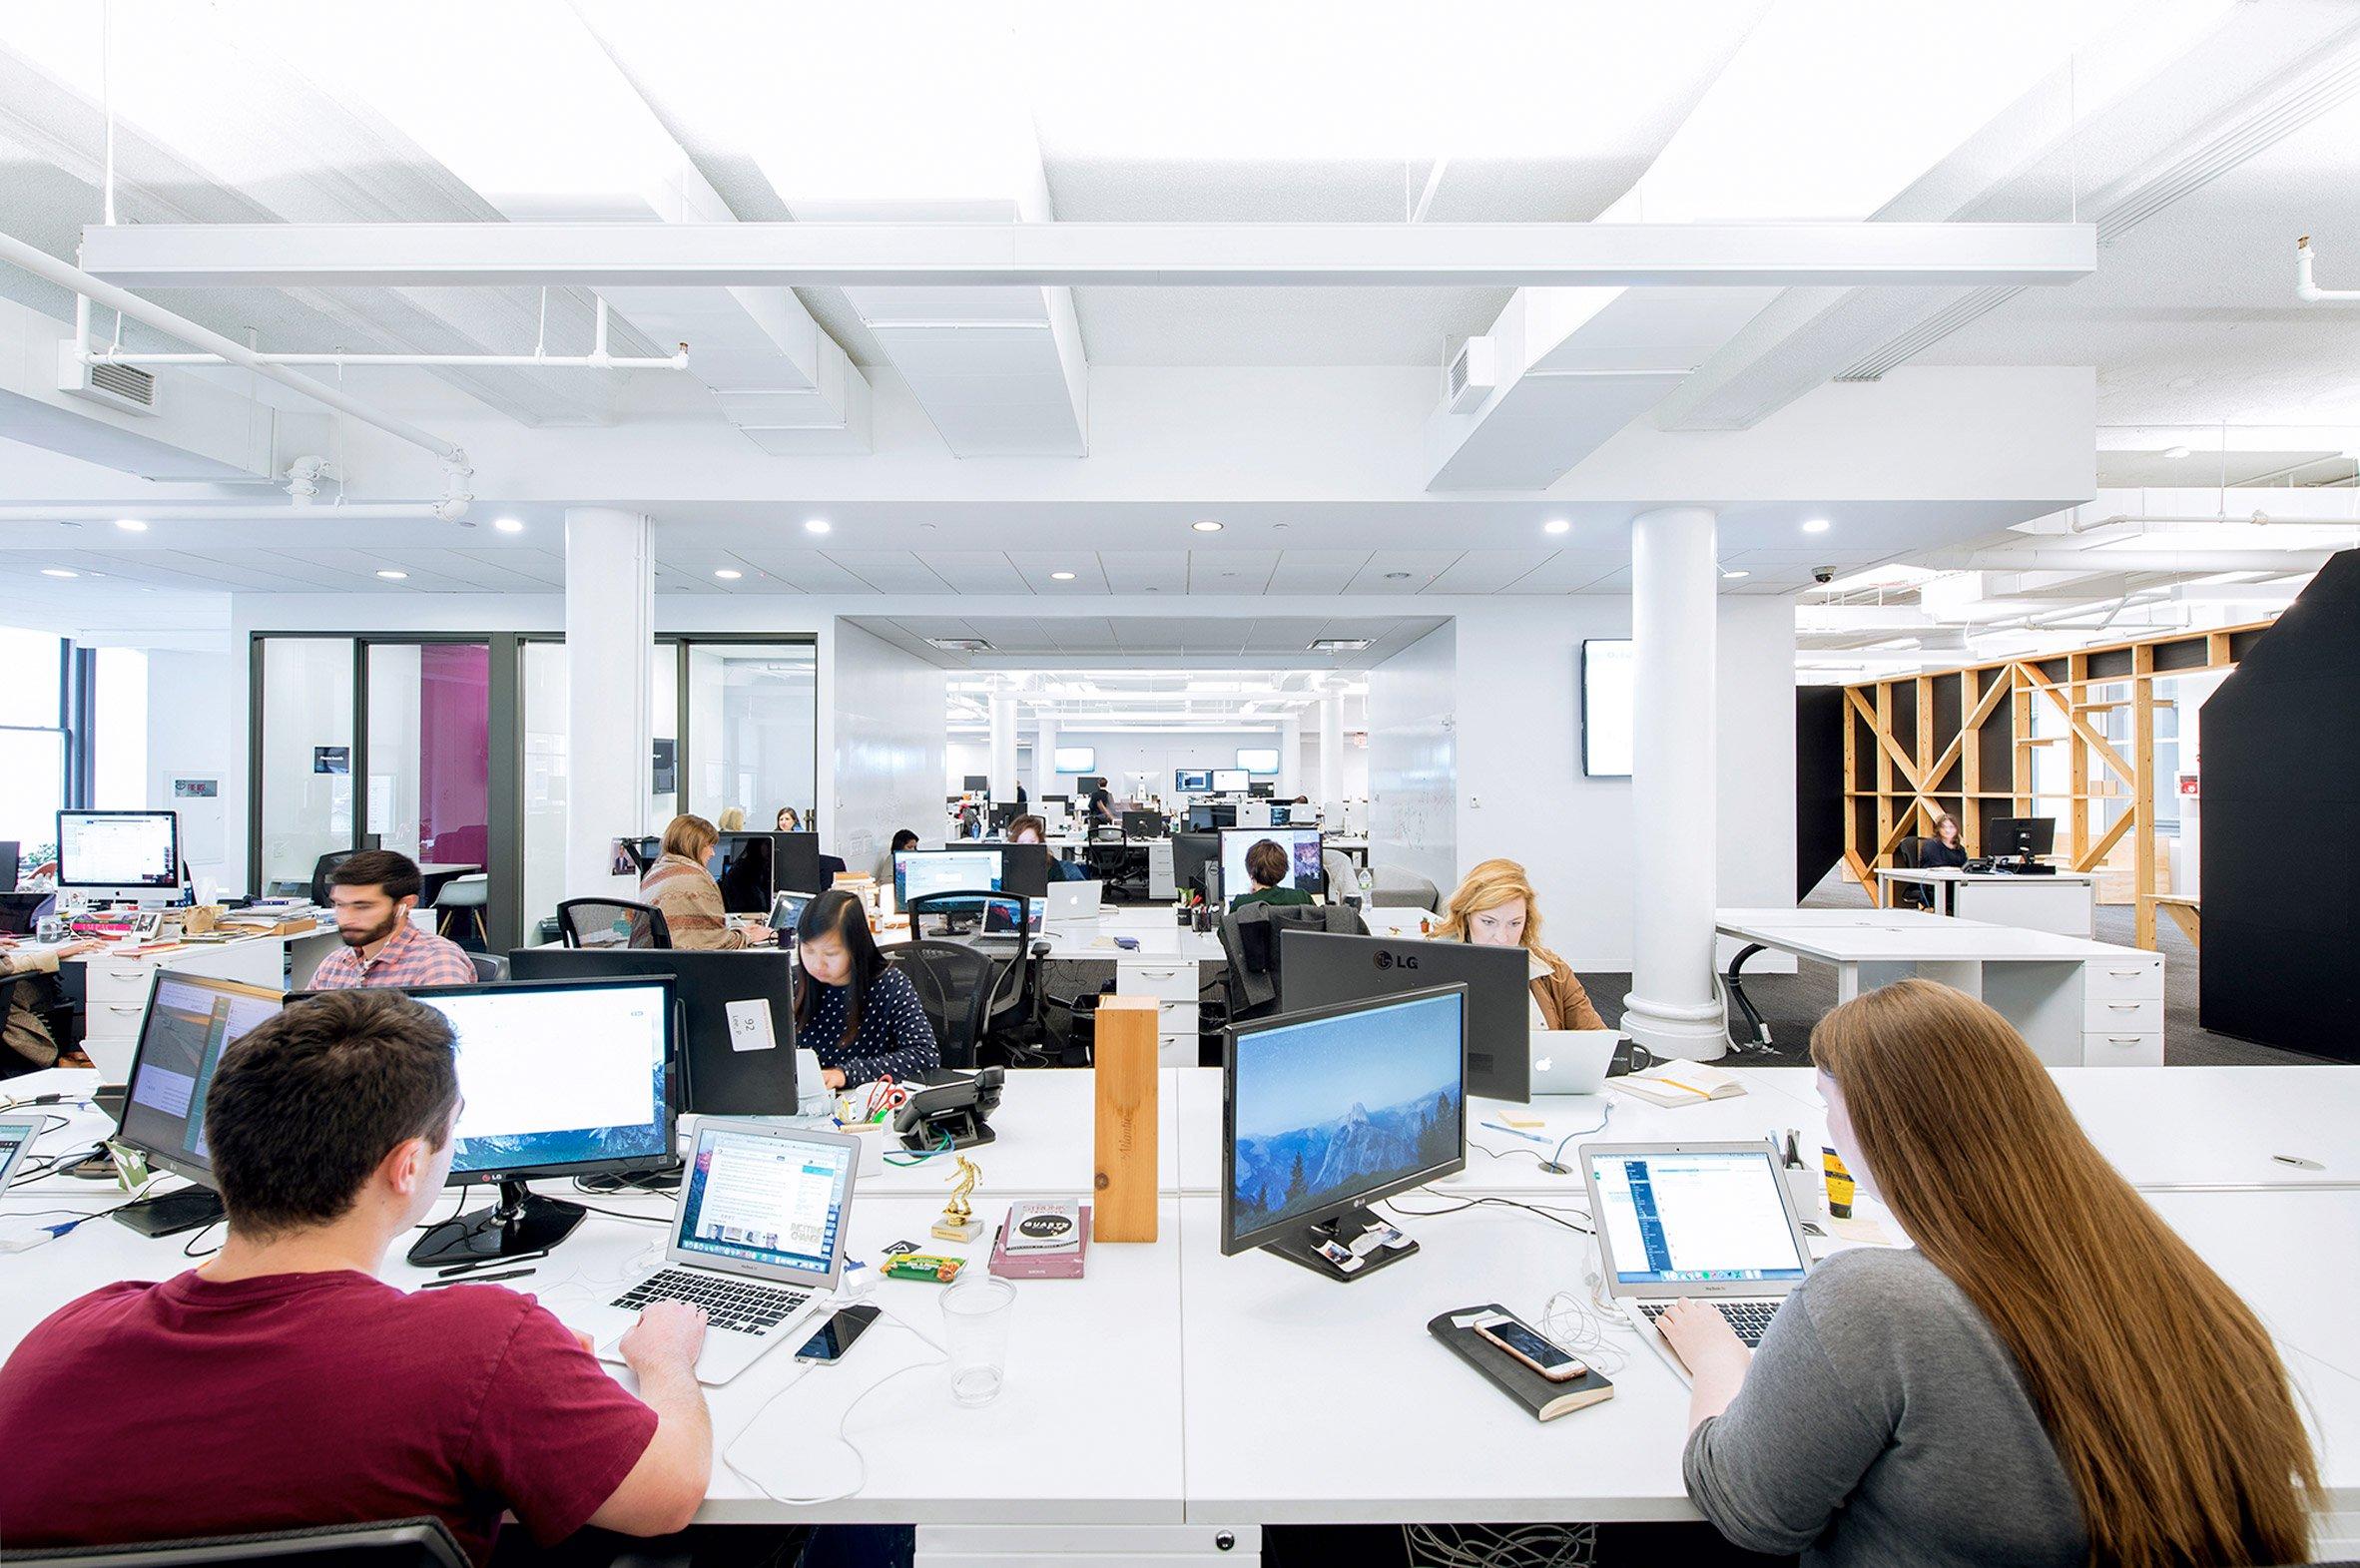 architecture-interiors-offices- manhatten-new-york-design-studia-osnovadesign-osnova-poltava_03